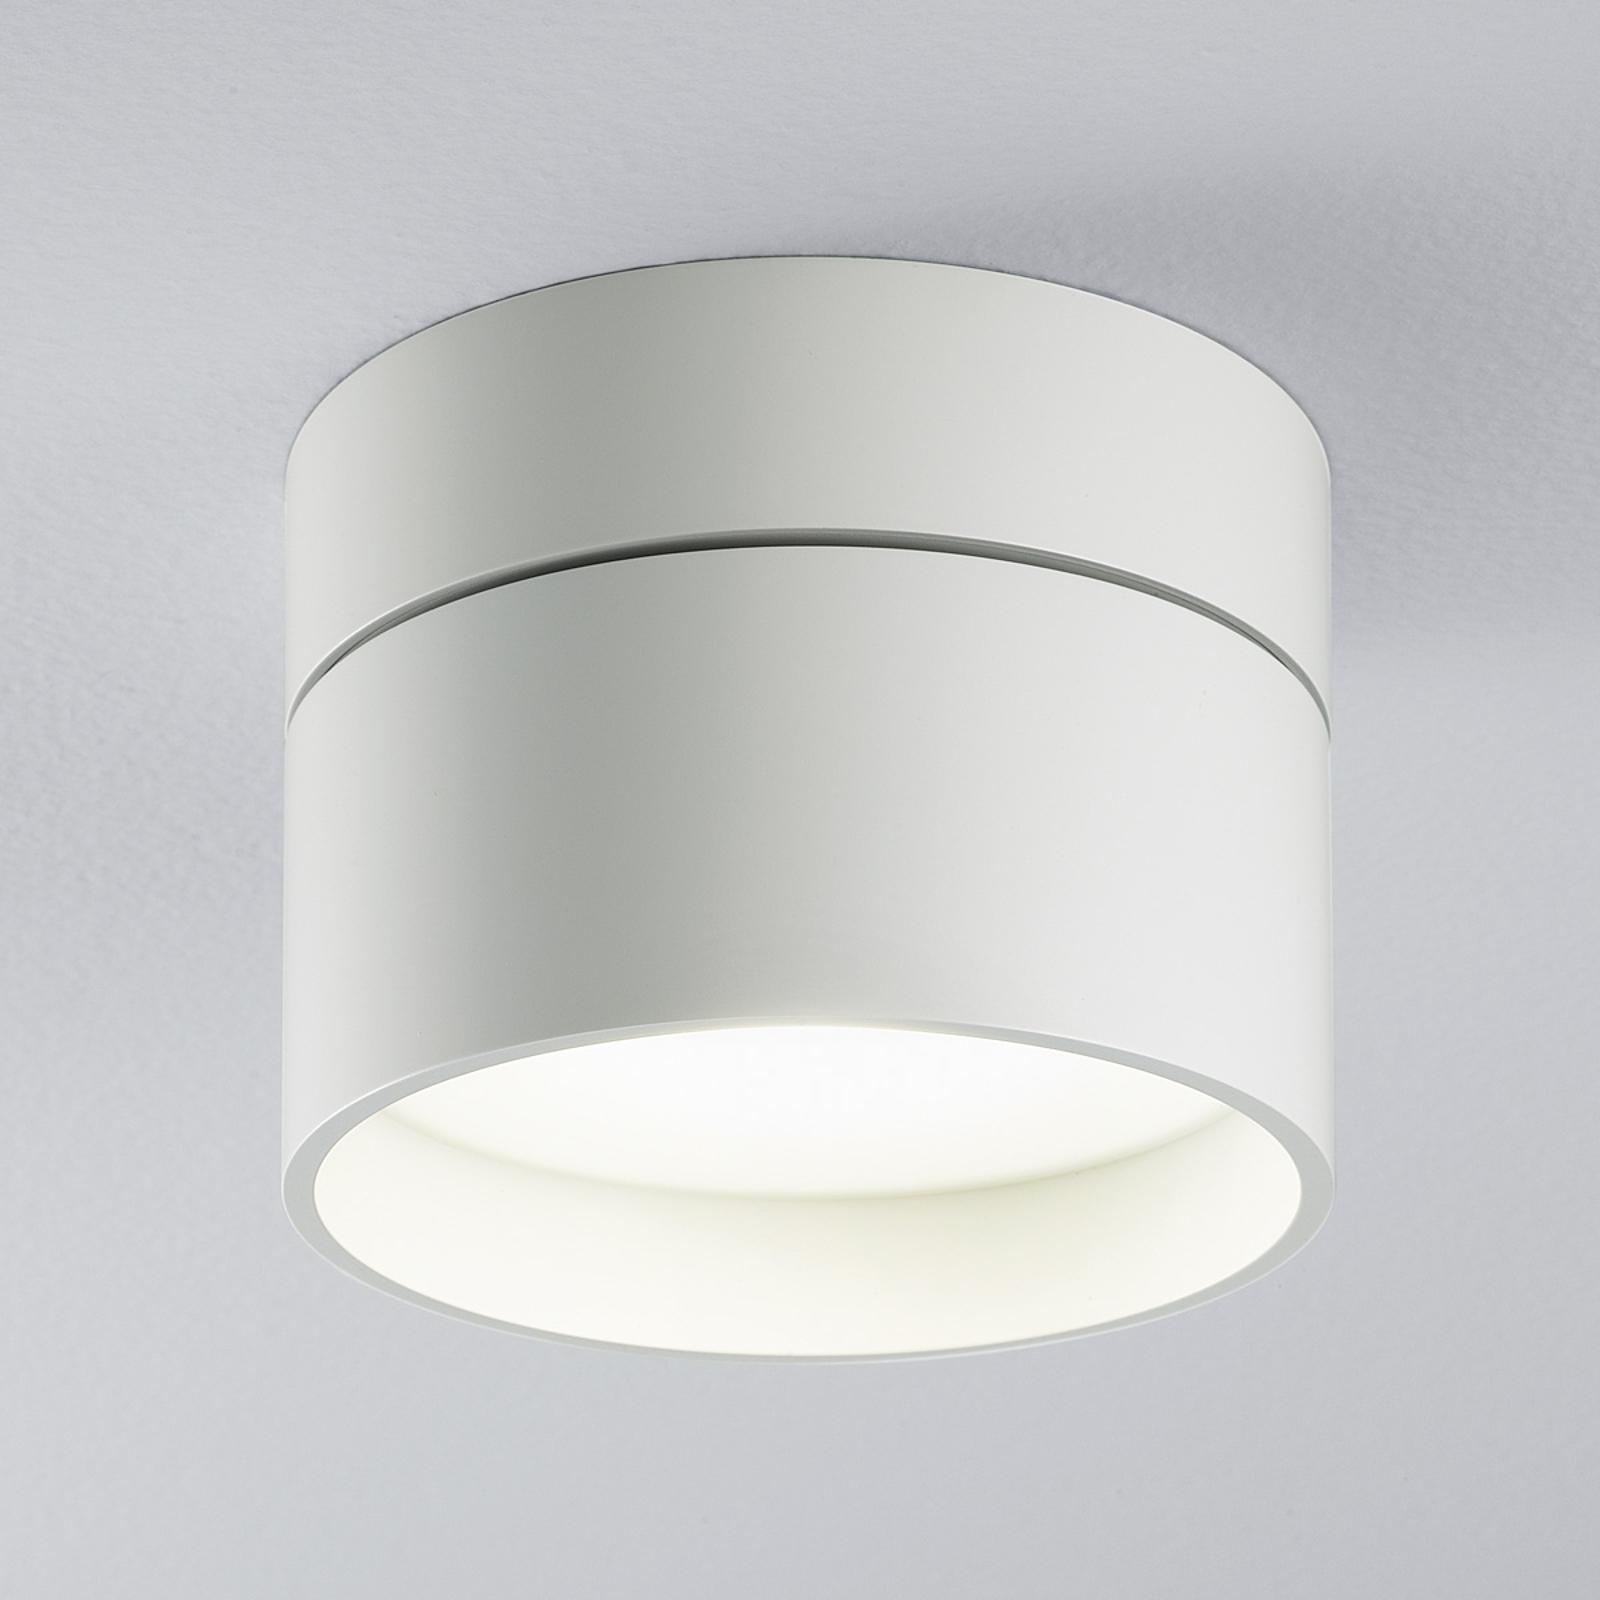 Lampa sufitowa LED Piper, 11 cm